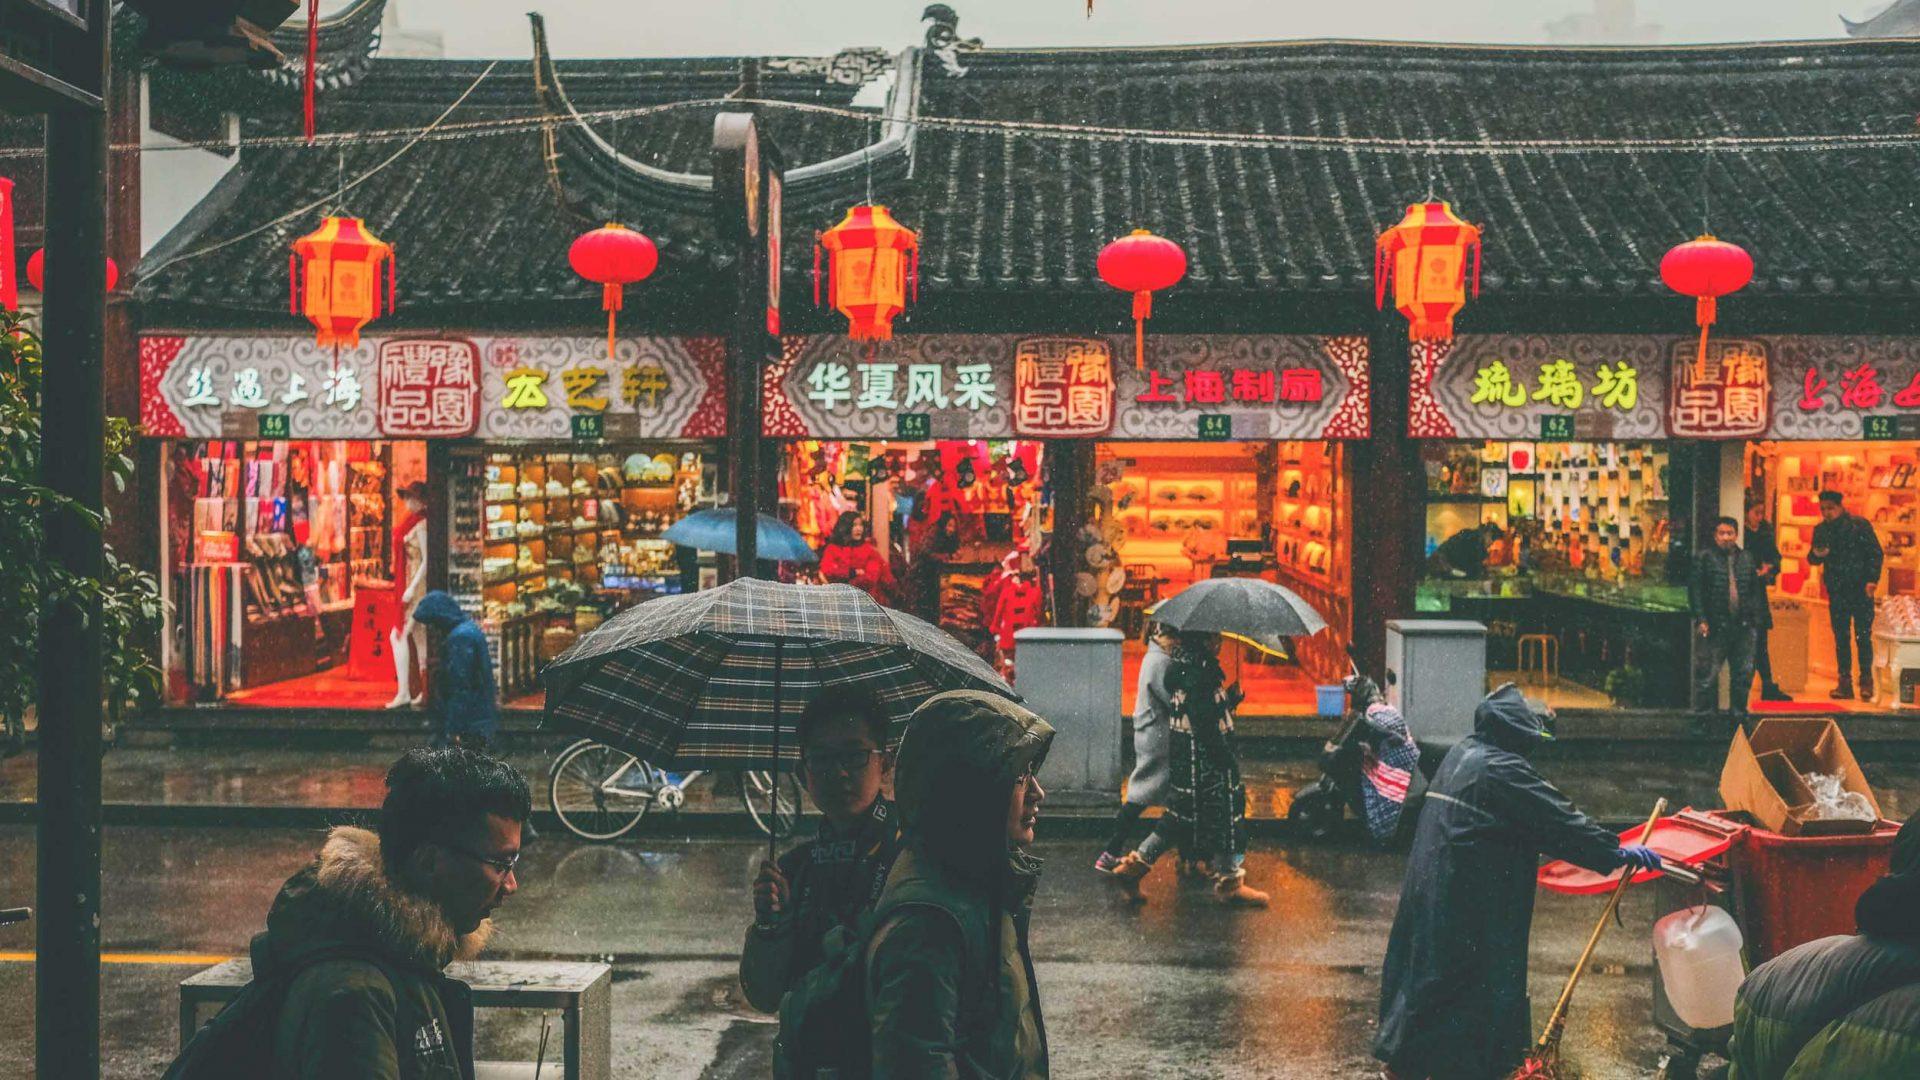 Rain falls in Shanghai, China.